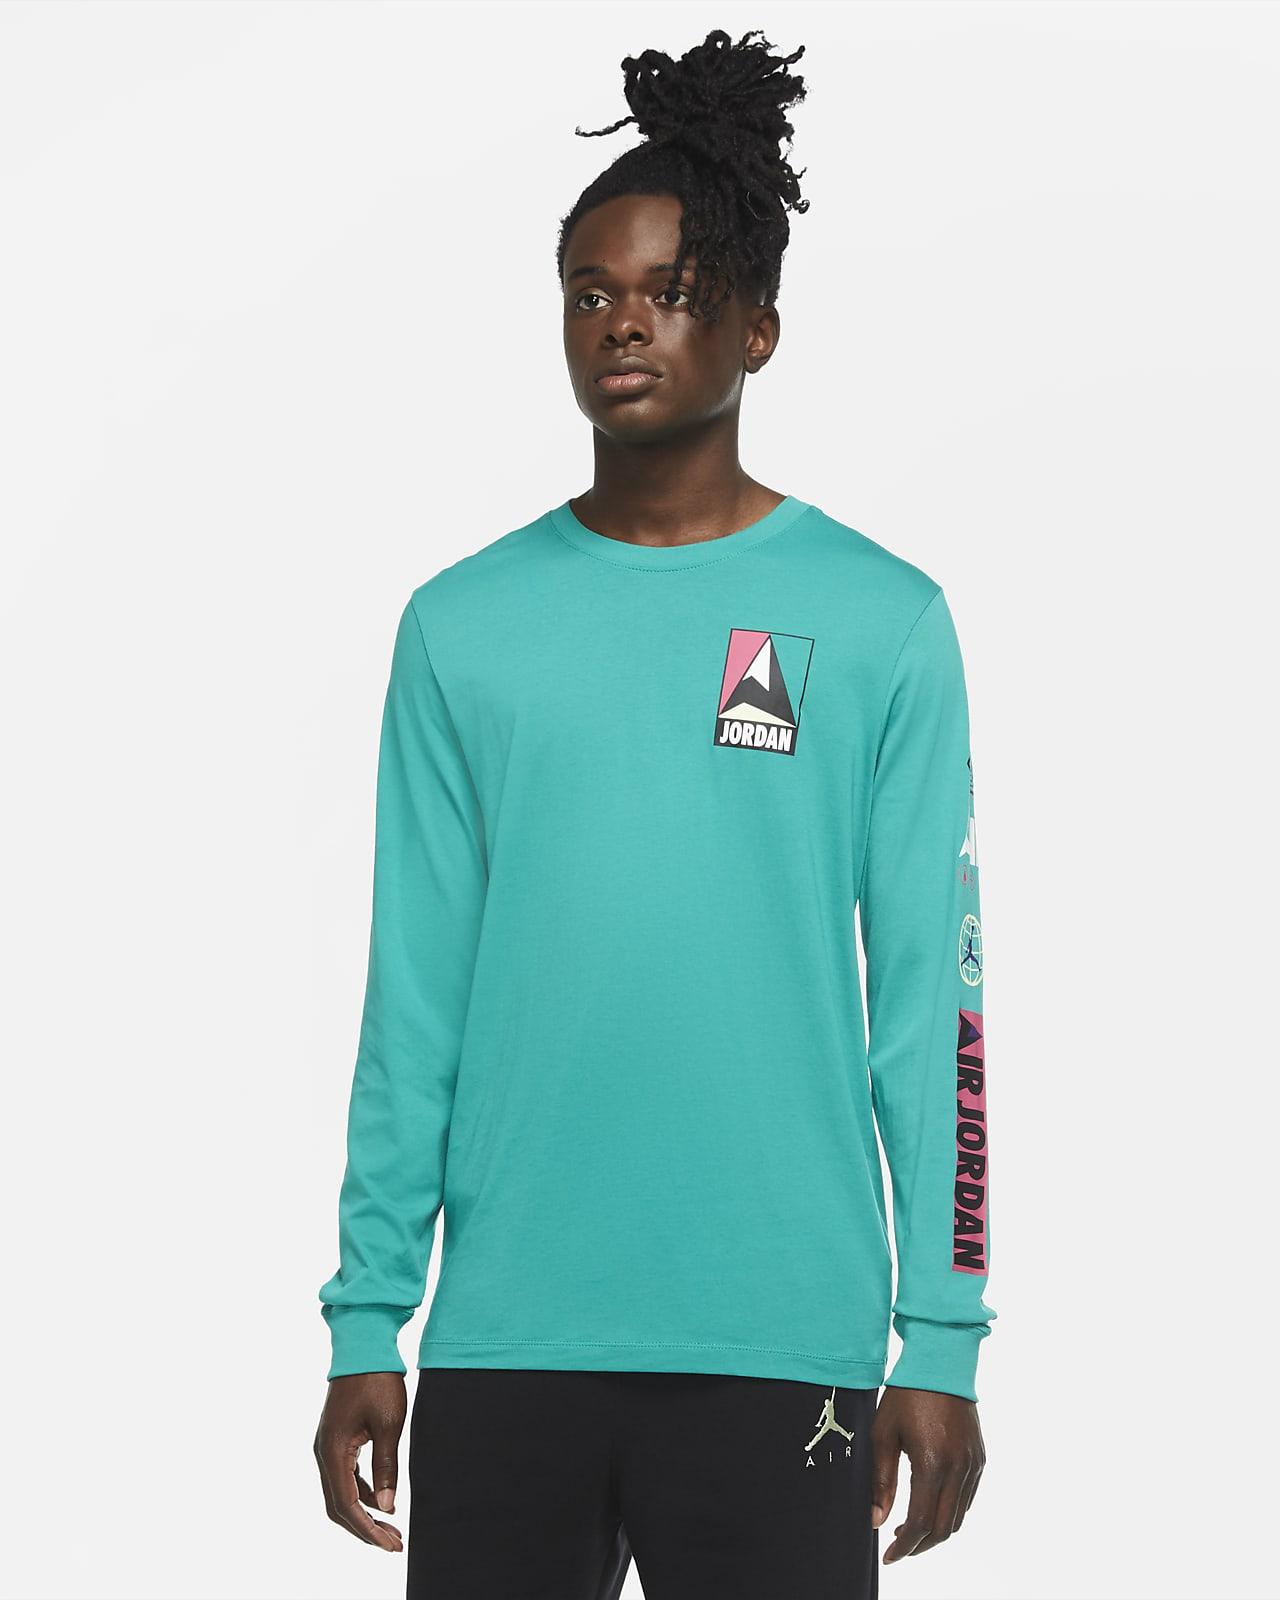 Jordan Winter Utility Men's Long-Sleeve T-Shirt